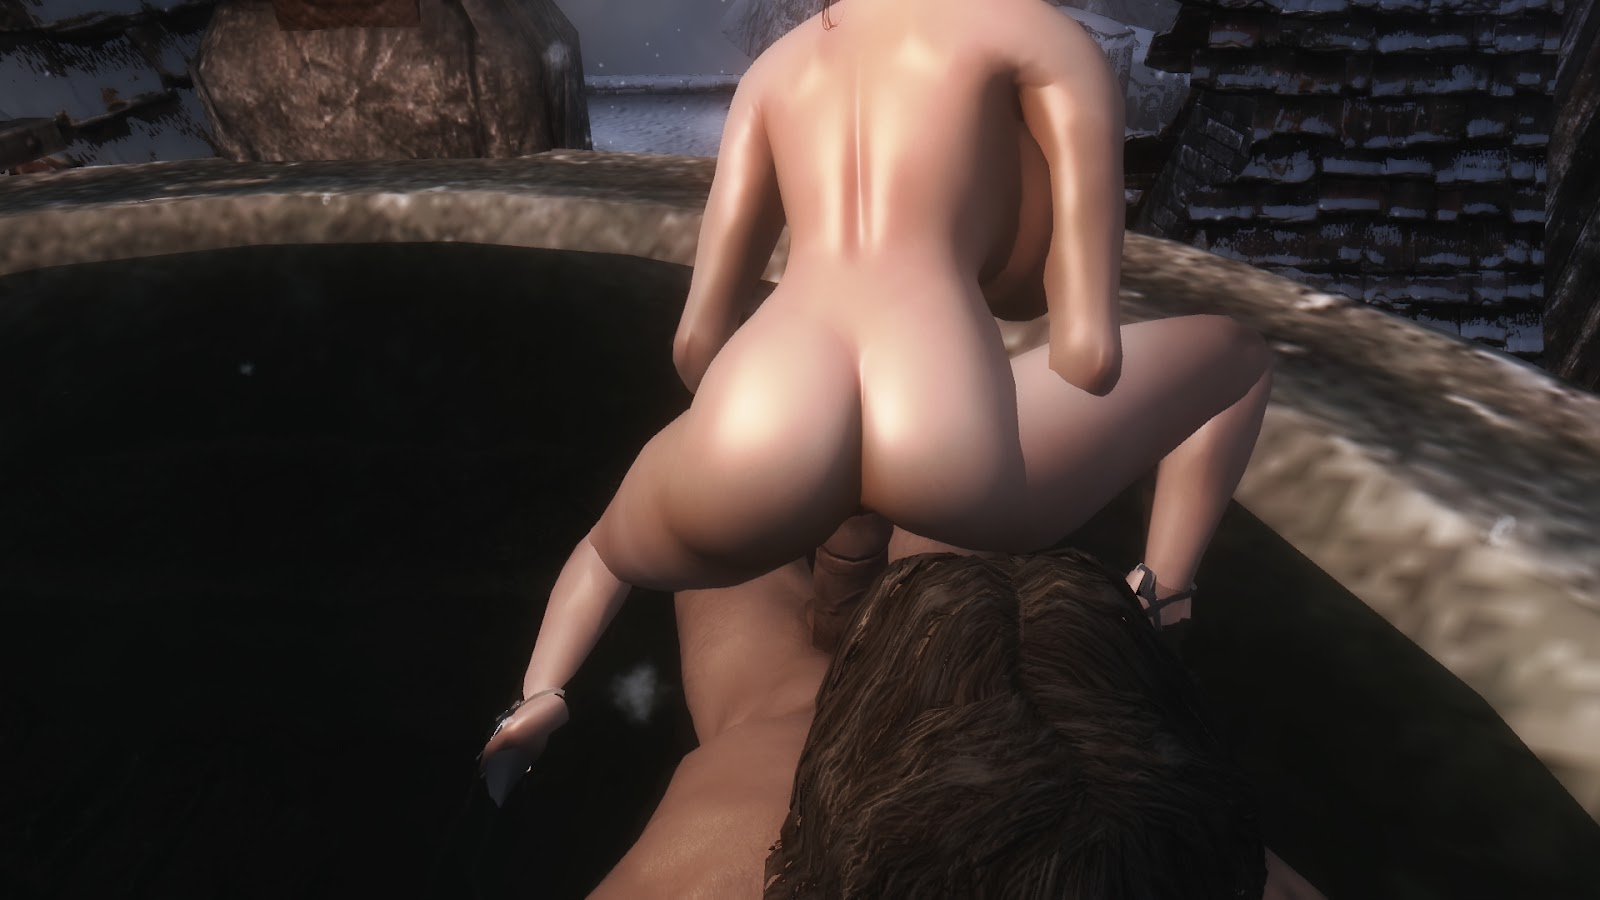 Petiteporn3d Nude Skins fucking movies